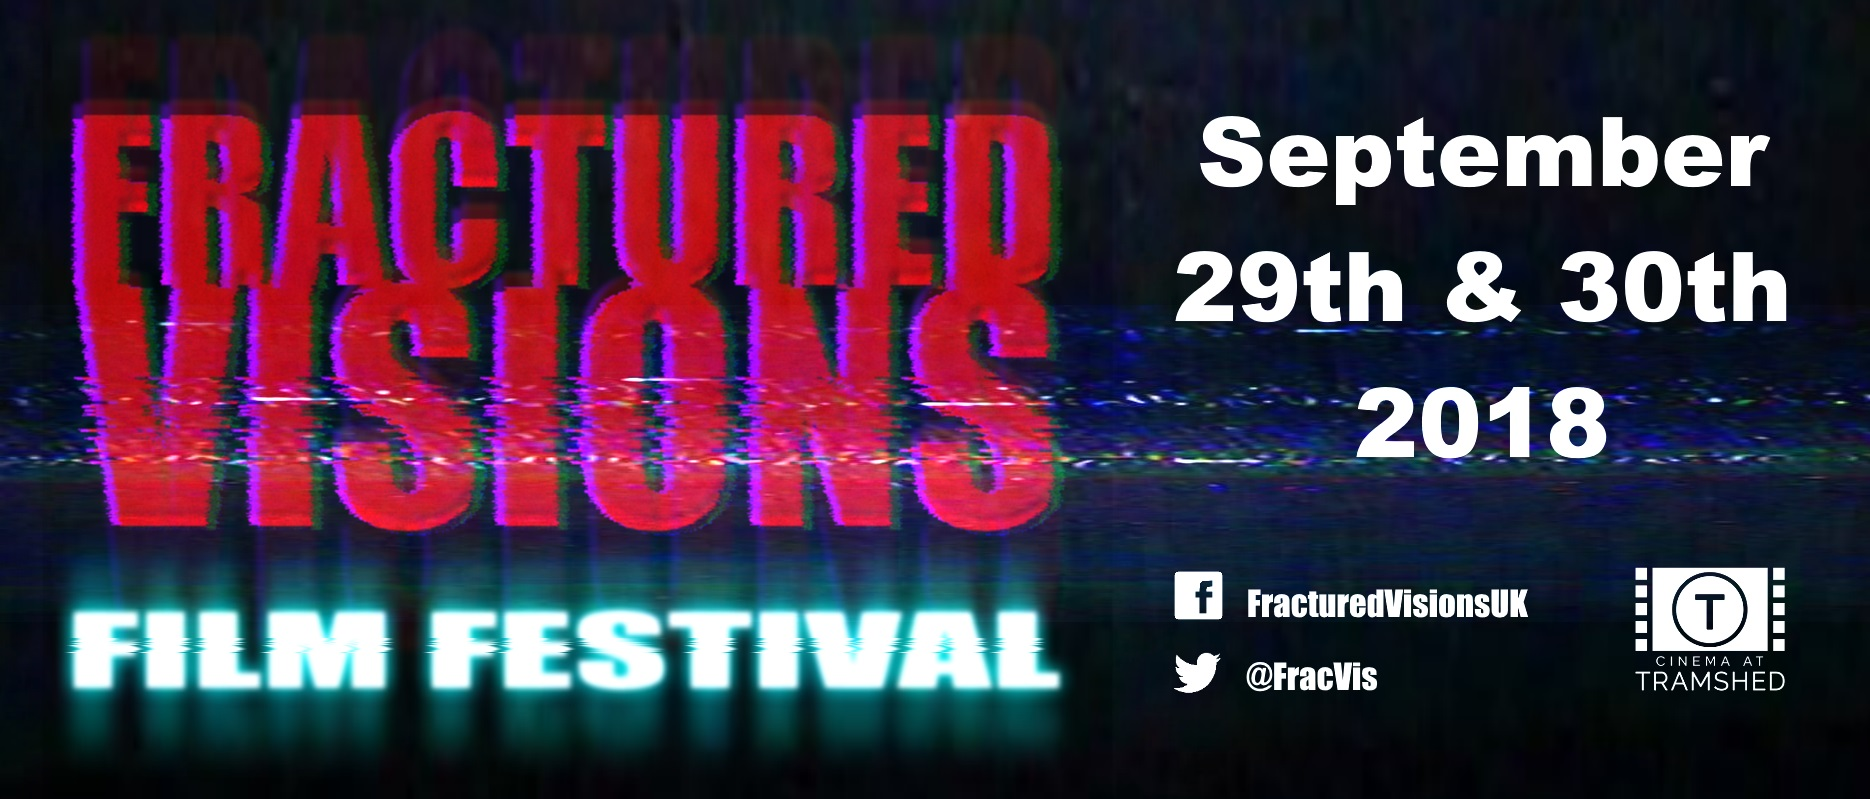 Fractured Visions Film Festival